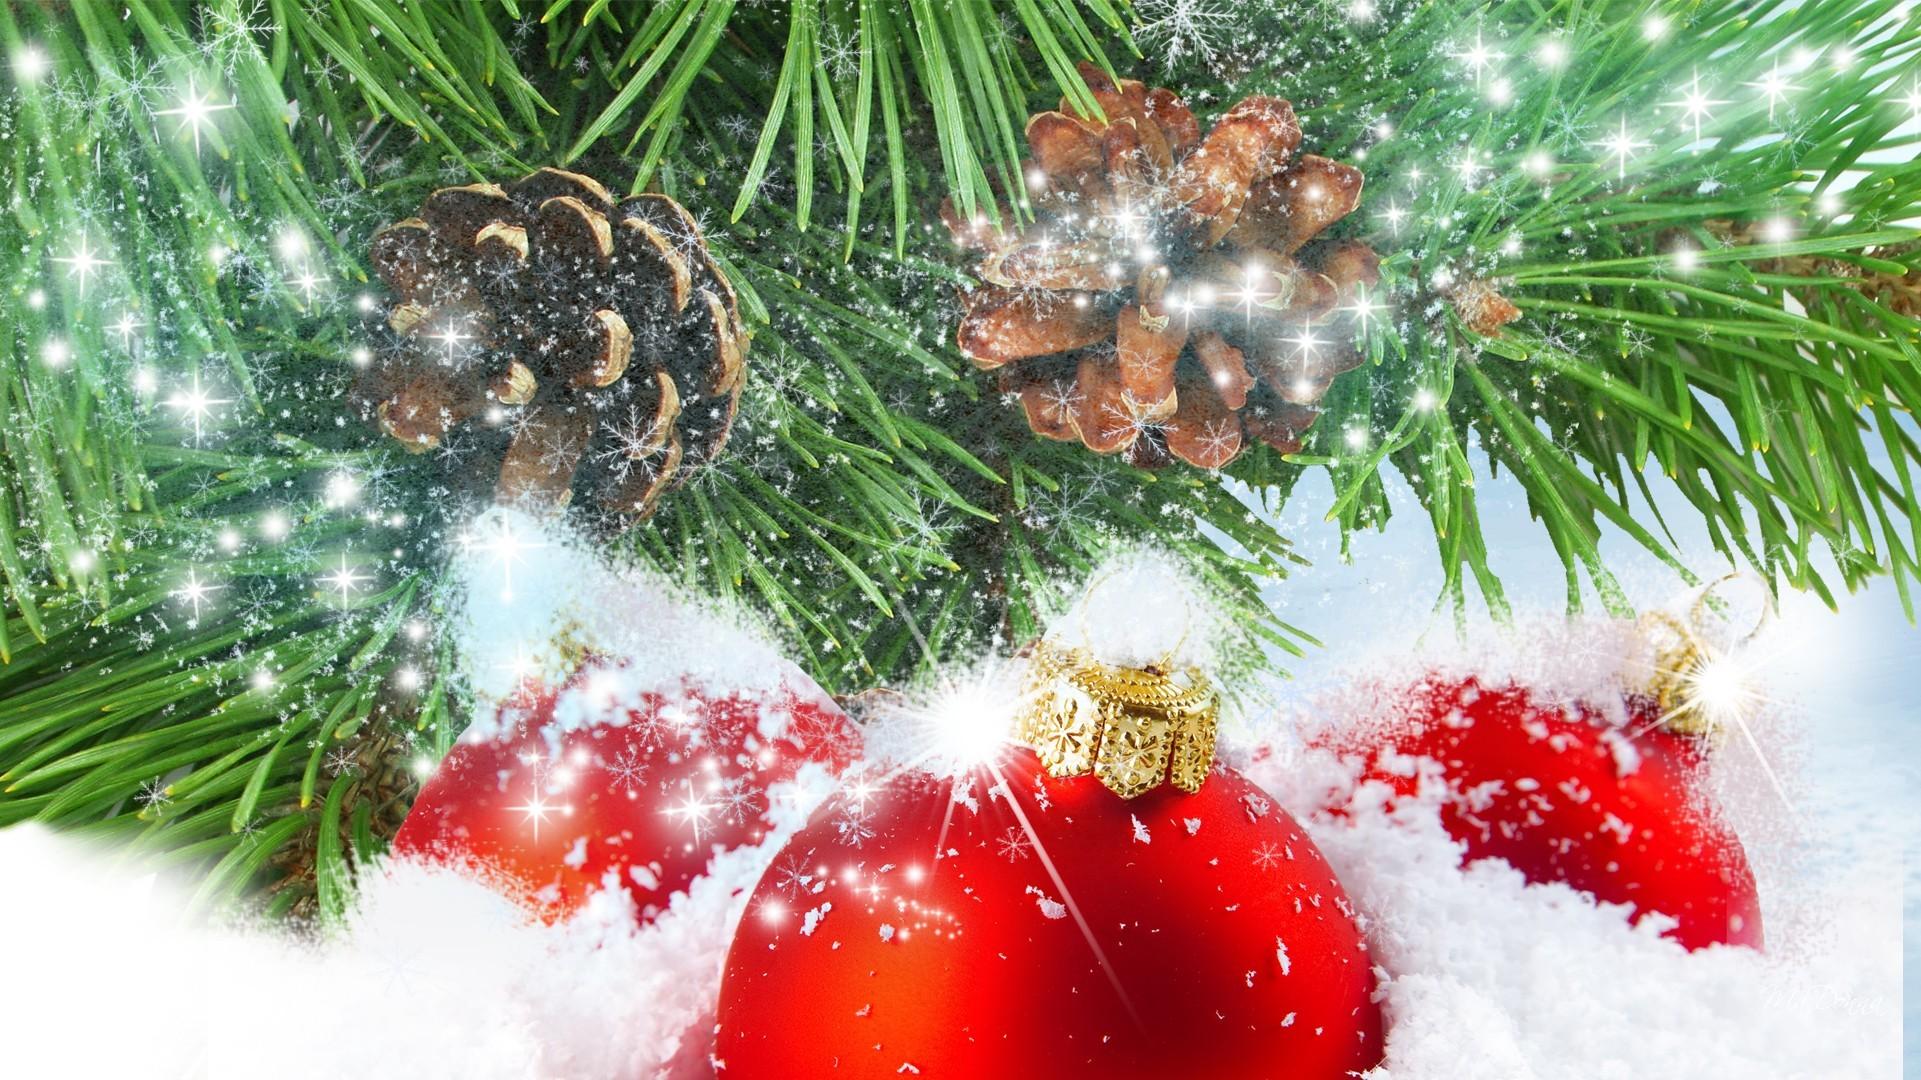 "… Winter holiday desktop themes, Holidays images wallpaper. 2. """